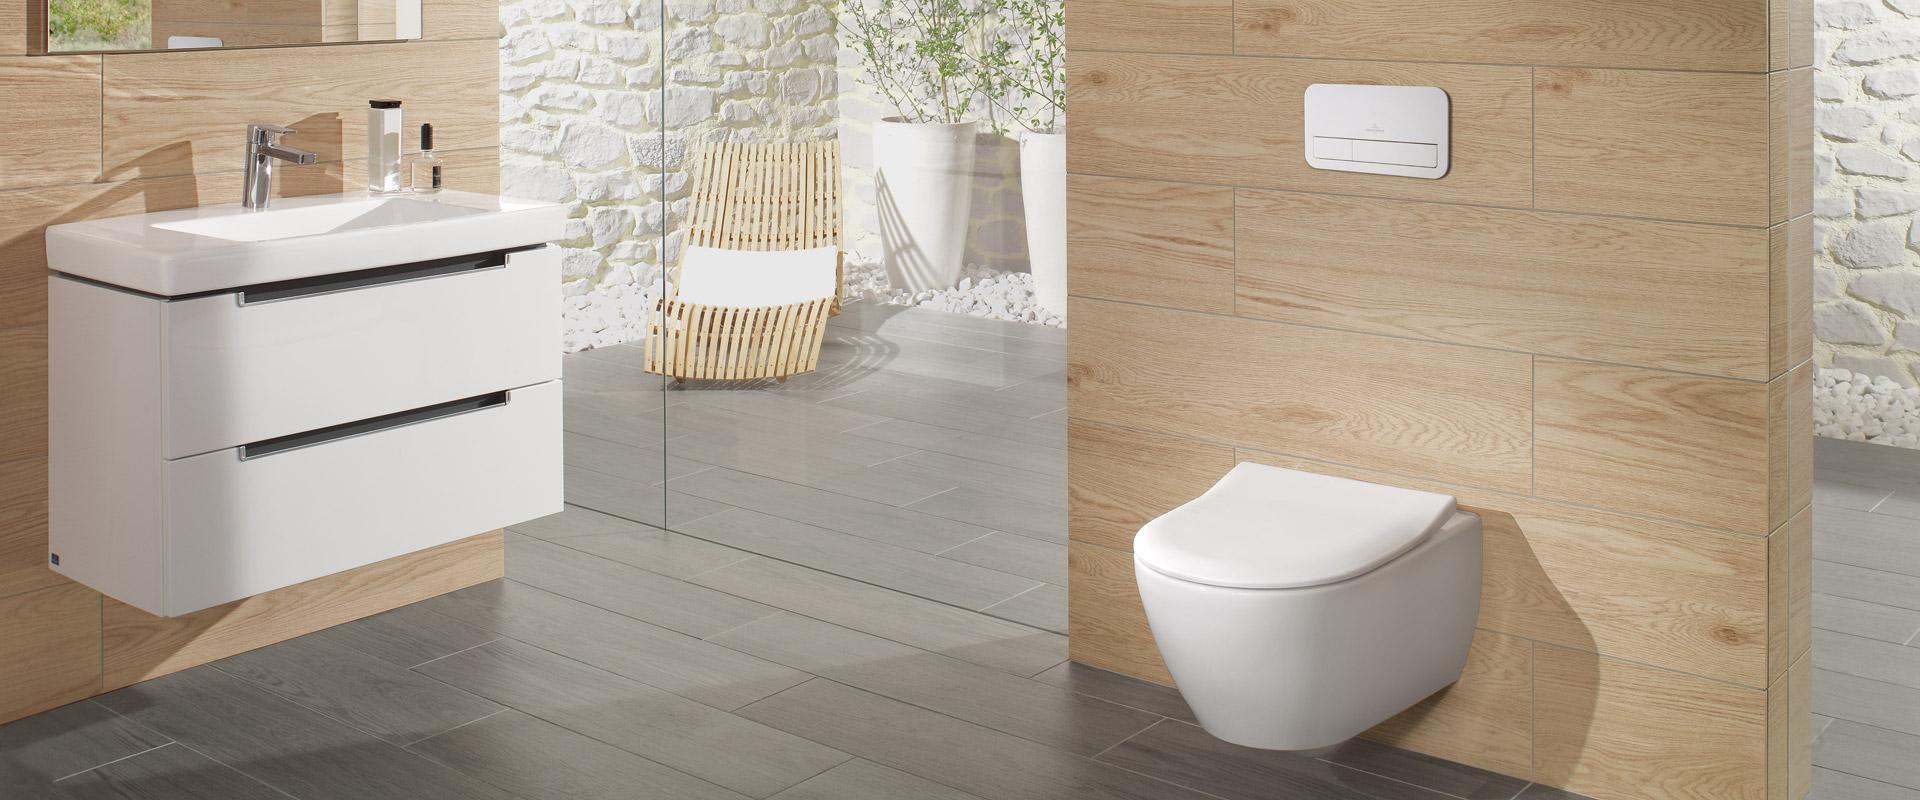 https://designerpages.s3.amazonaws.com/assets/59086831/subway-sanitary-03.jpg